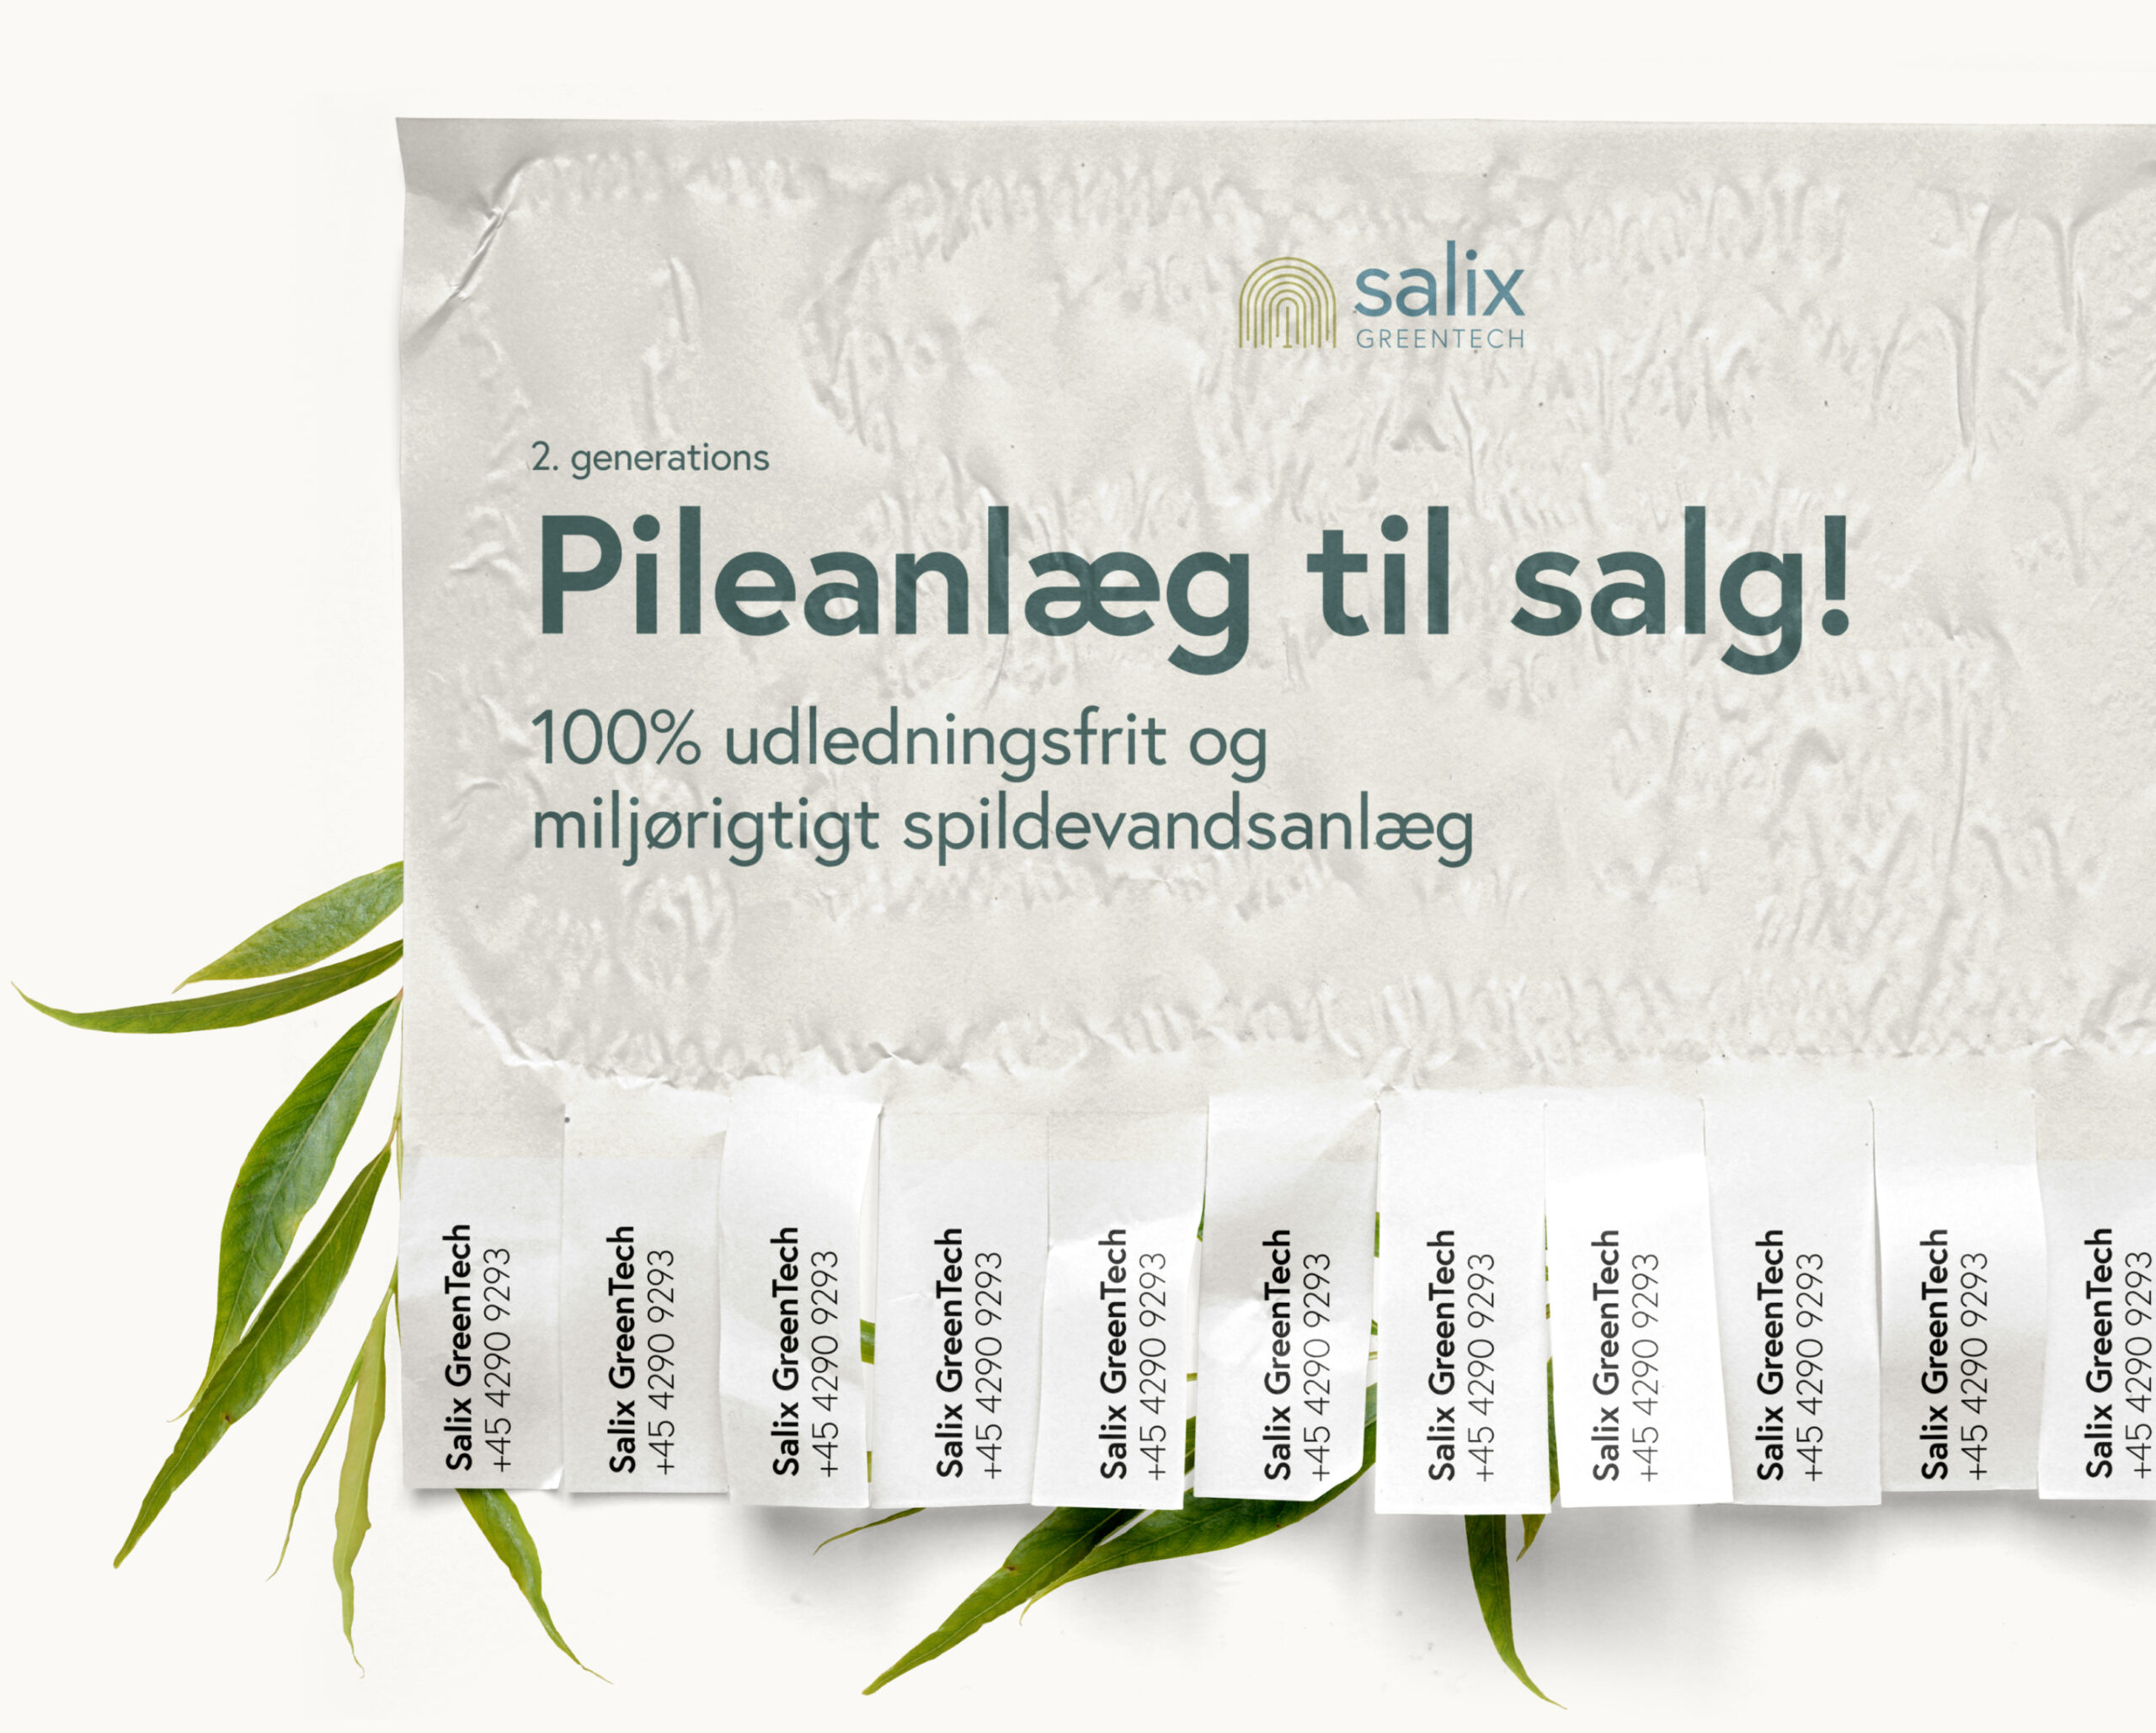 Pileanlaeg-til-salg